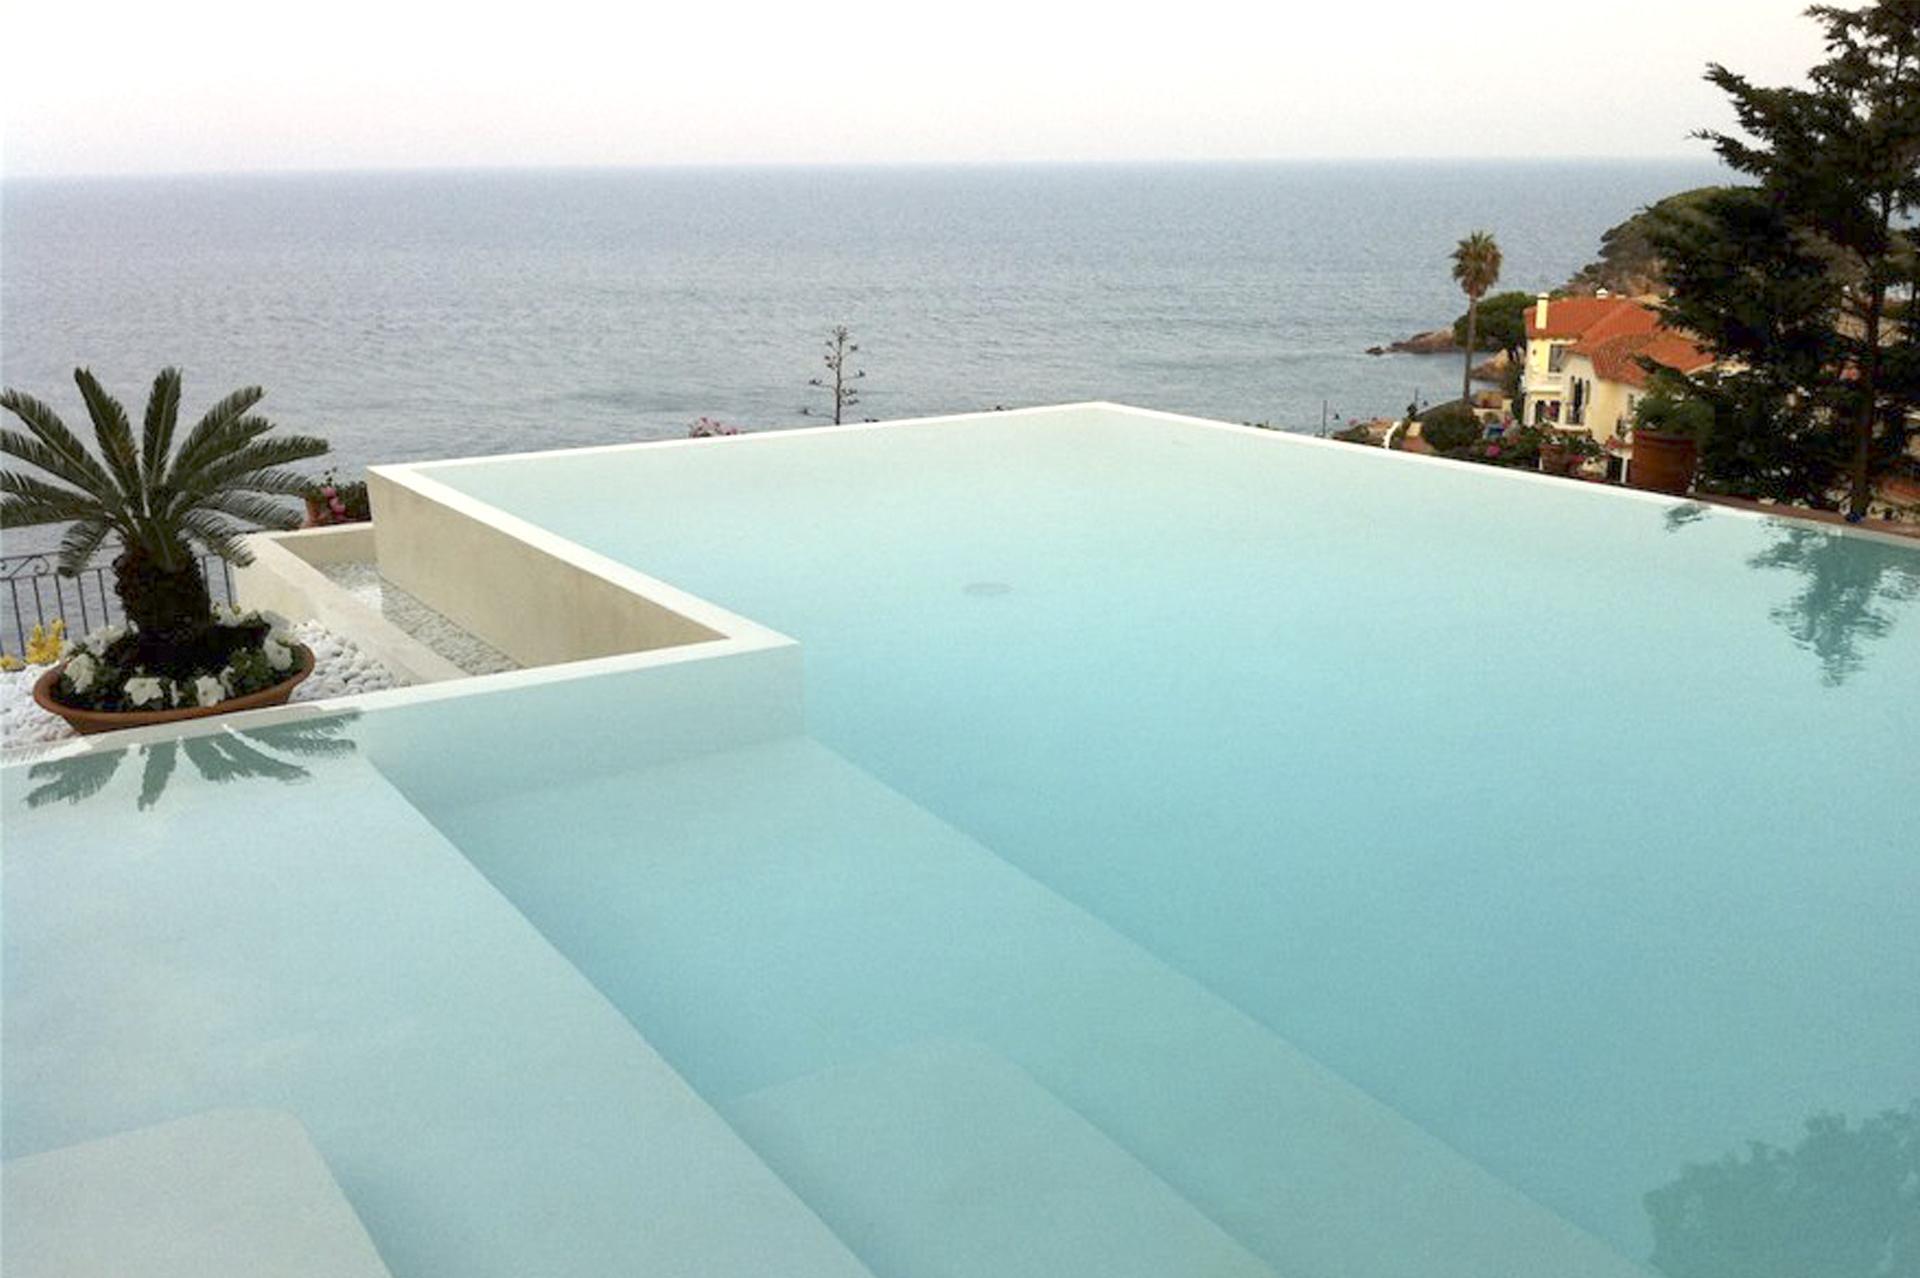 poolplay_reformas_piscinas_27